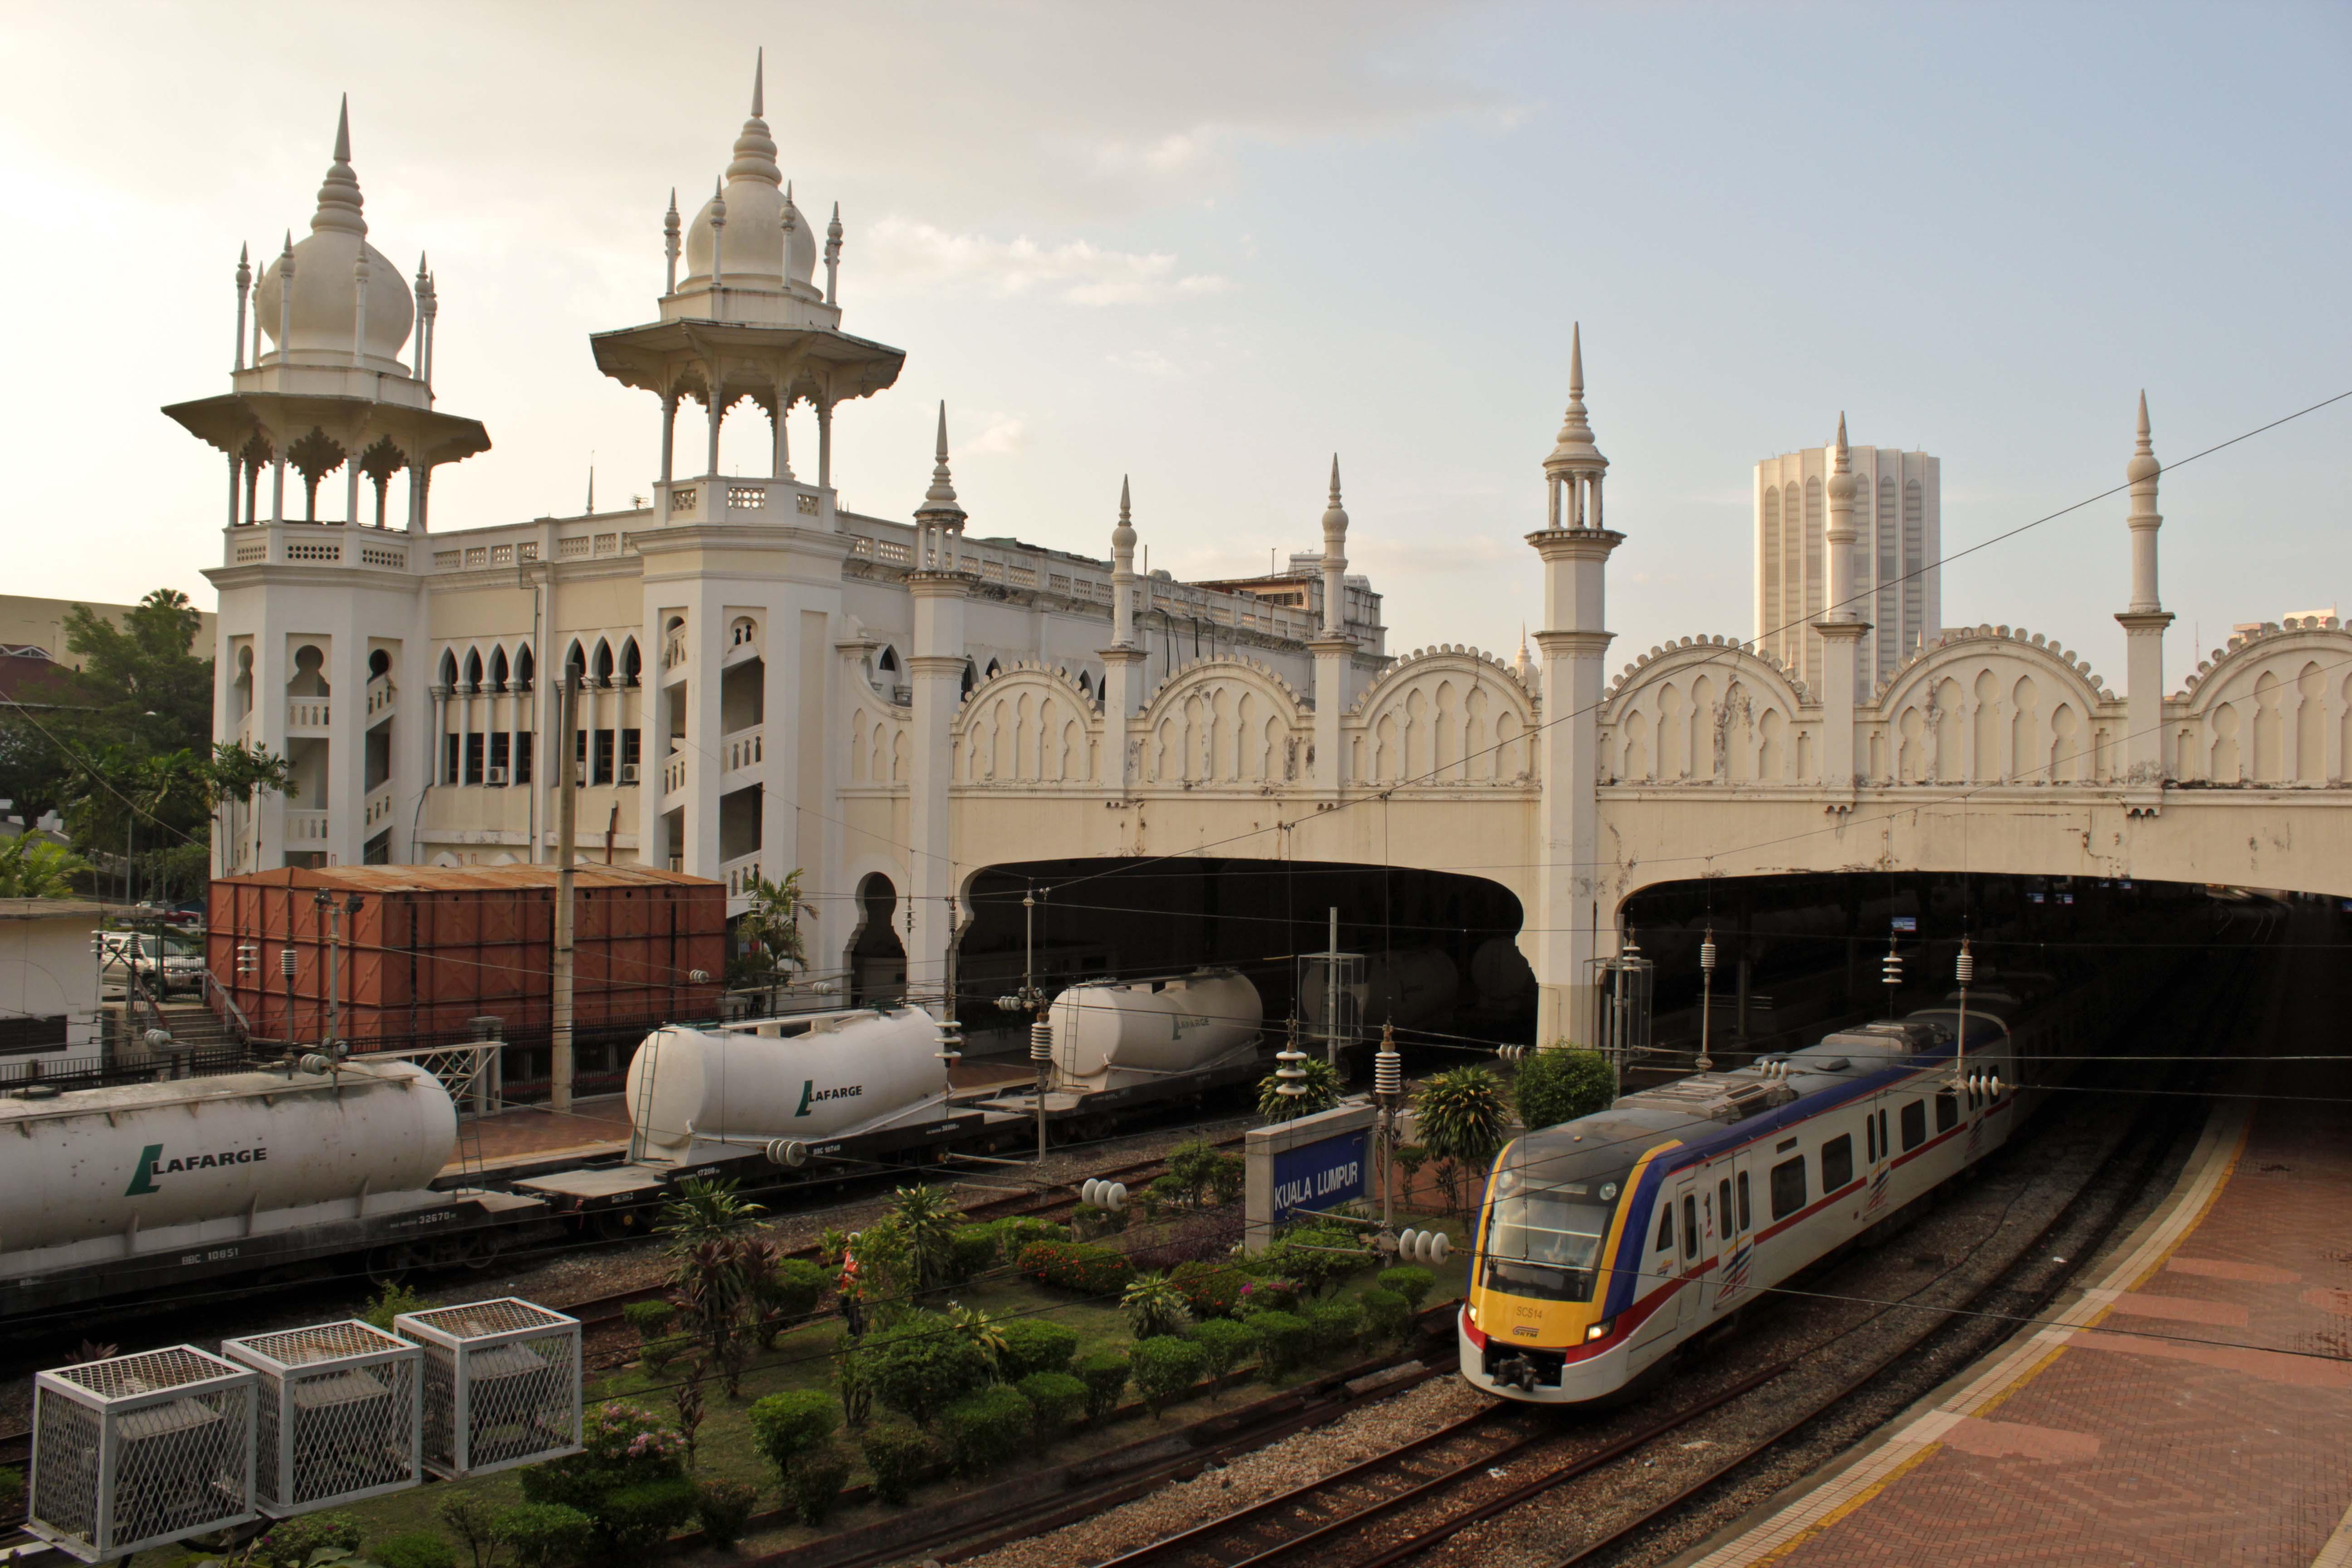 Kuala Lumpur Sentral railway station - Wikipedia